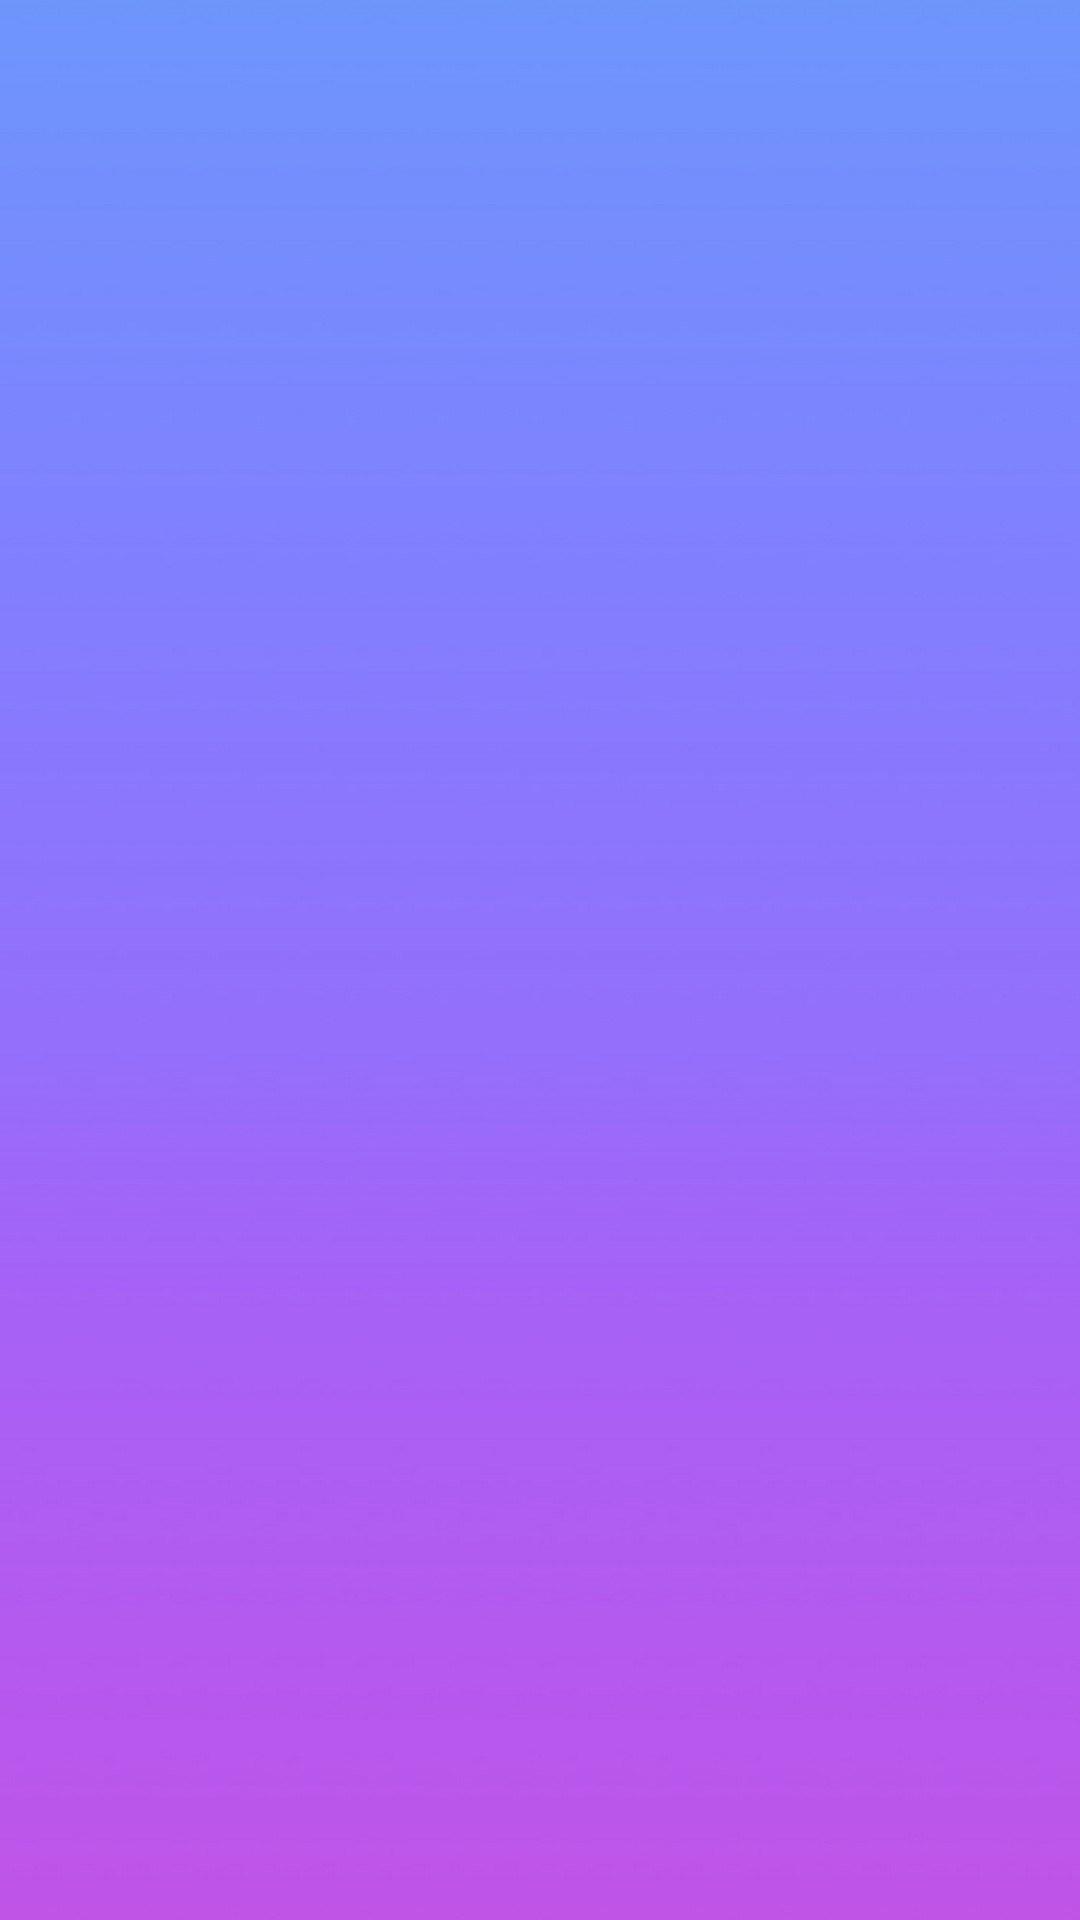 Gradient Iphone Wallpaper - Обои Для Айфона Градиент , HD Wallpaper & Backgrounds